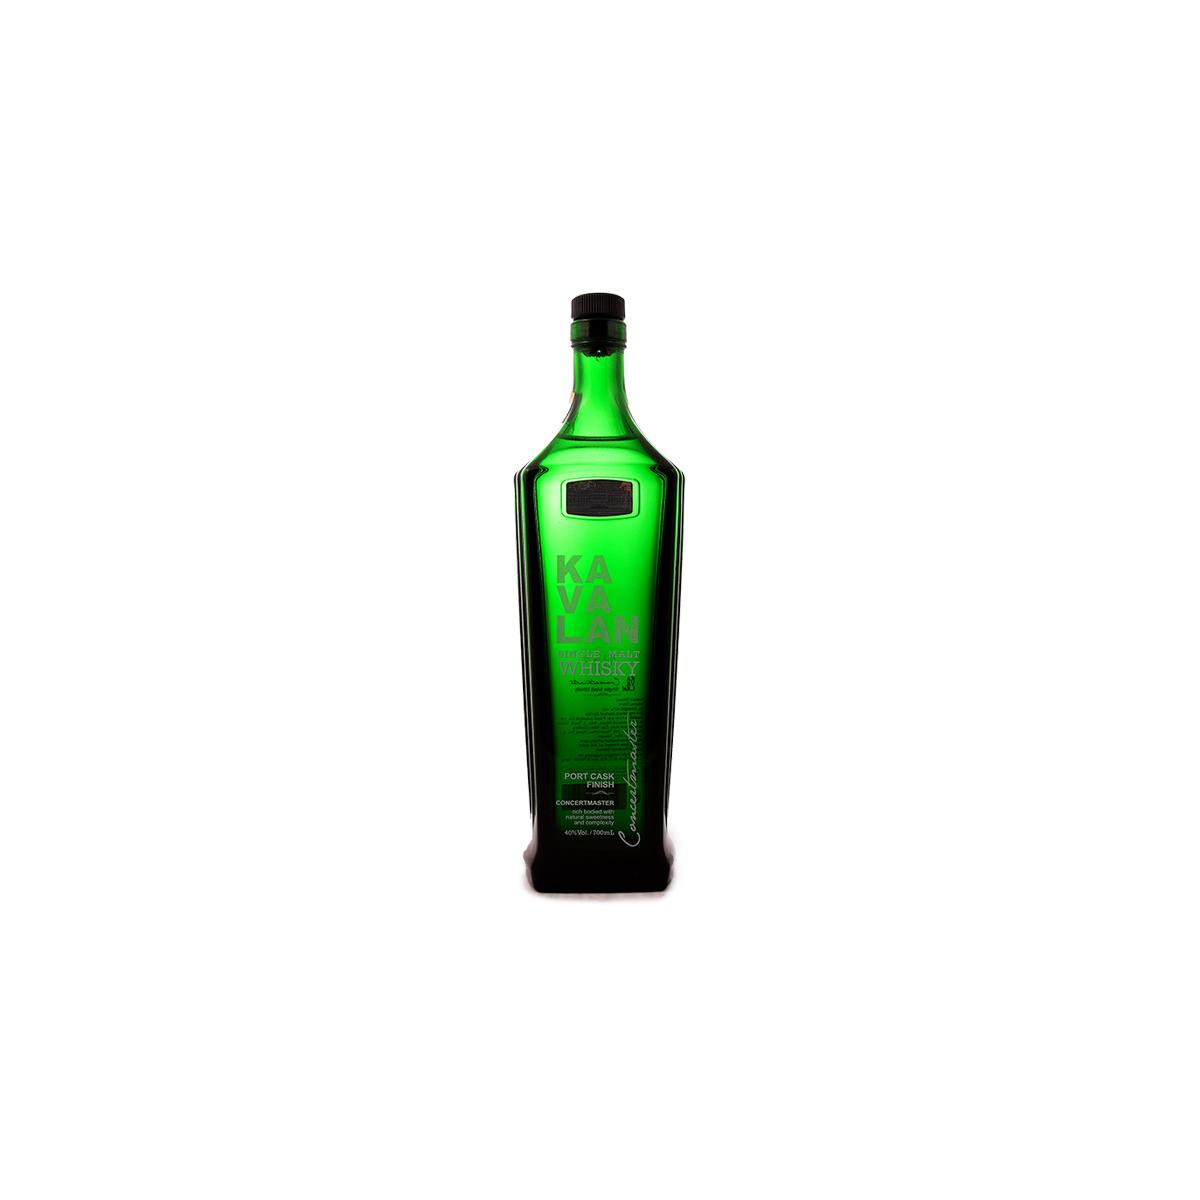 Kavalan Concertmaster (40%) - 30 ml.